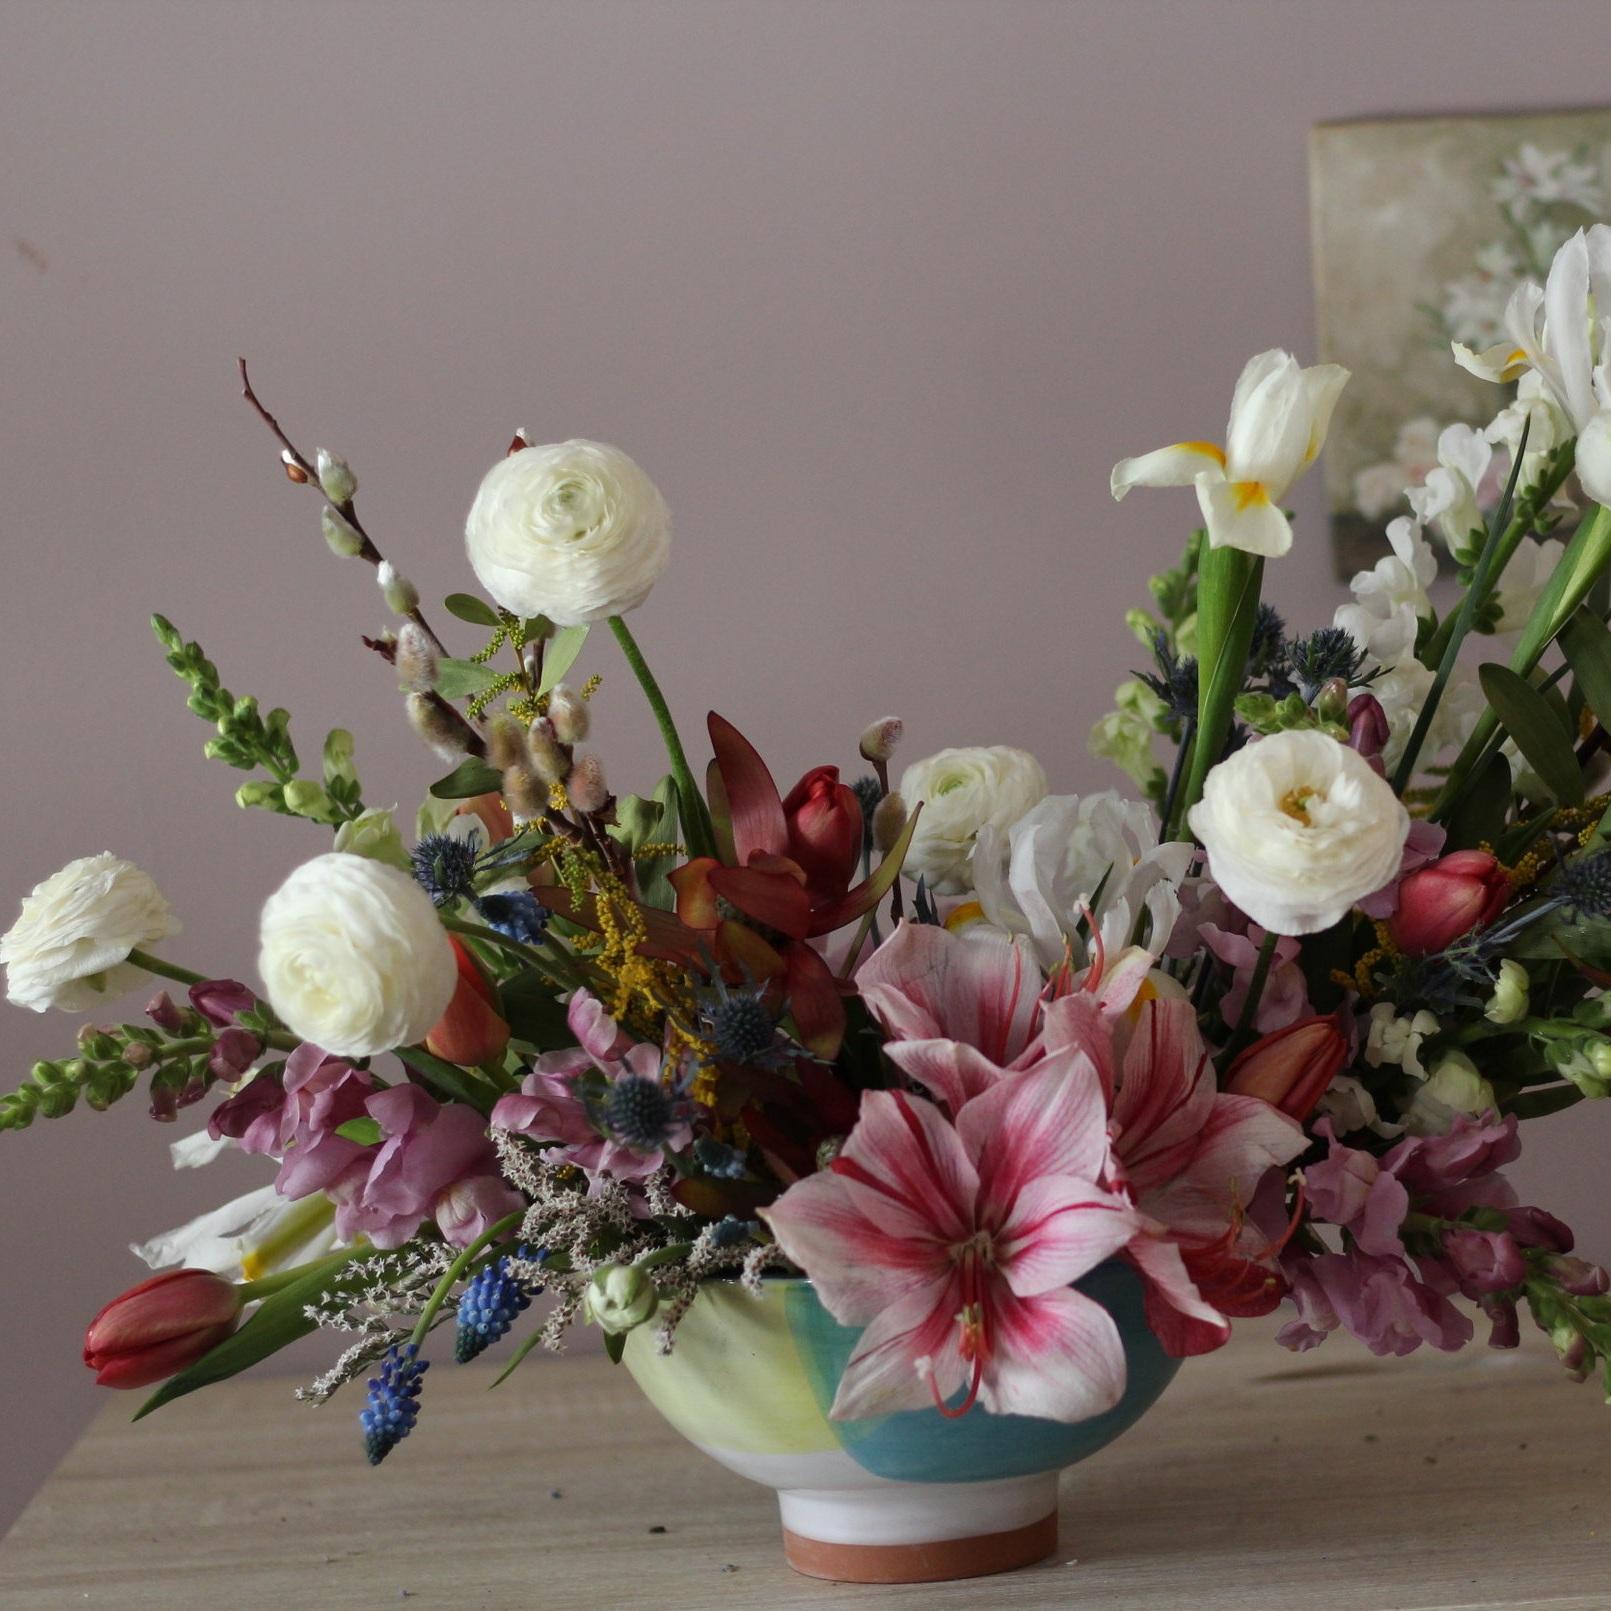 Vase Arrangements - $175 & $325